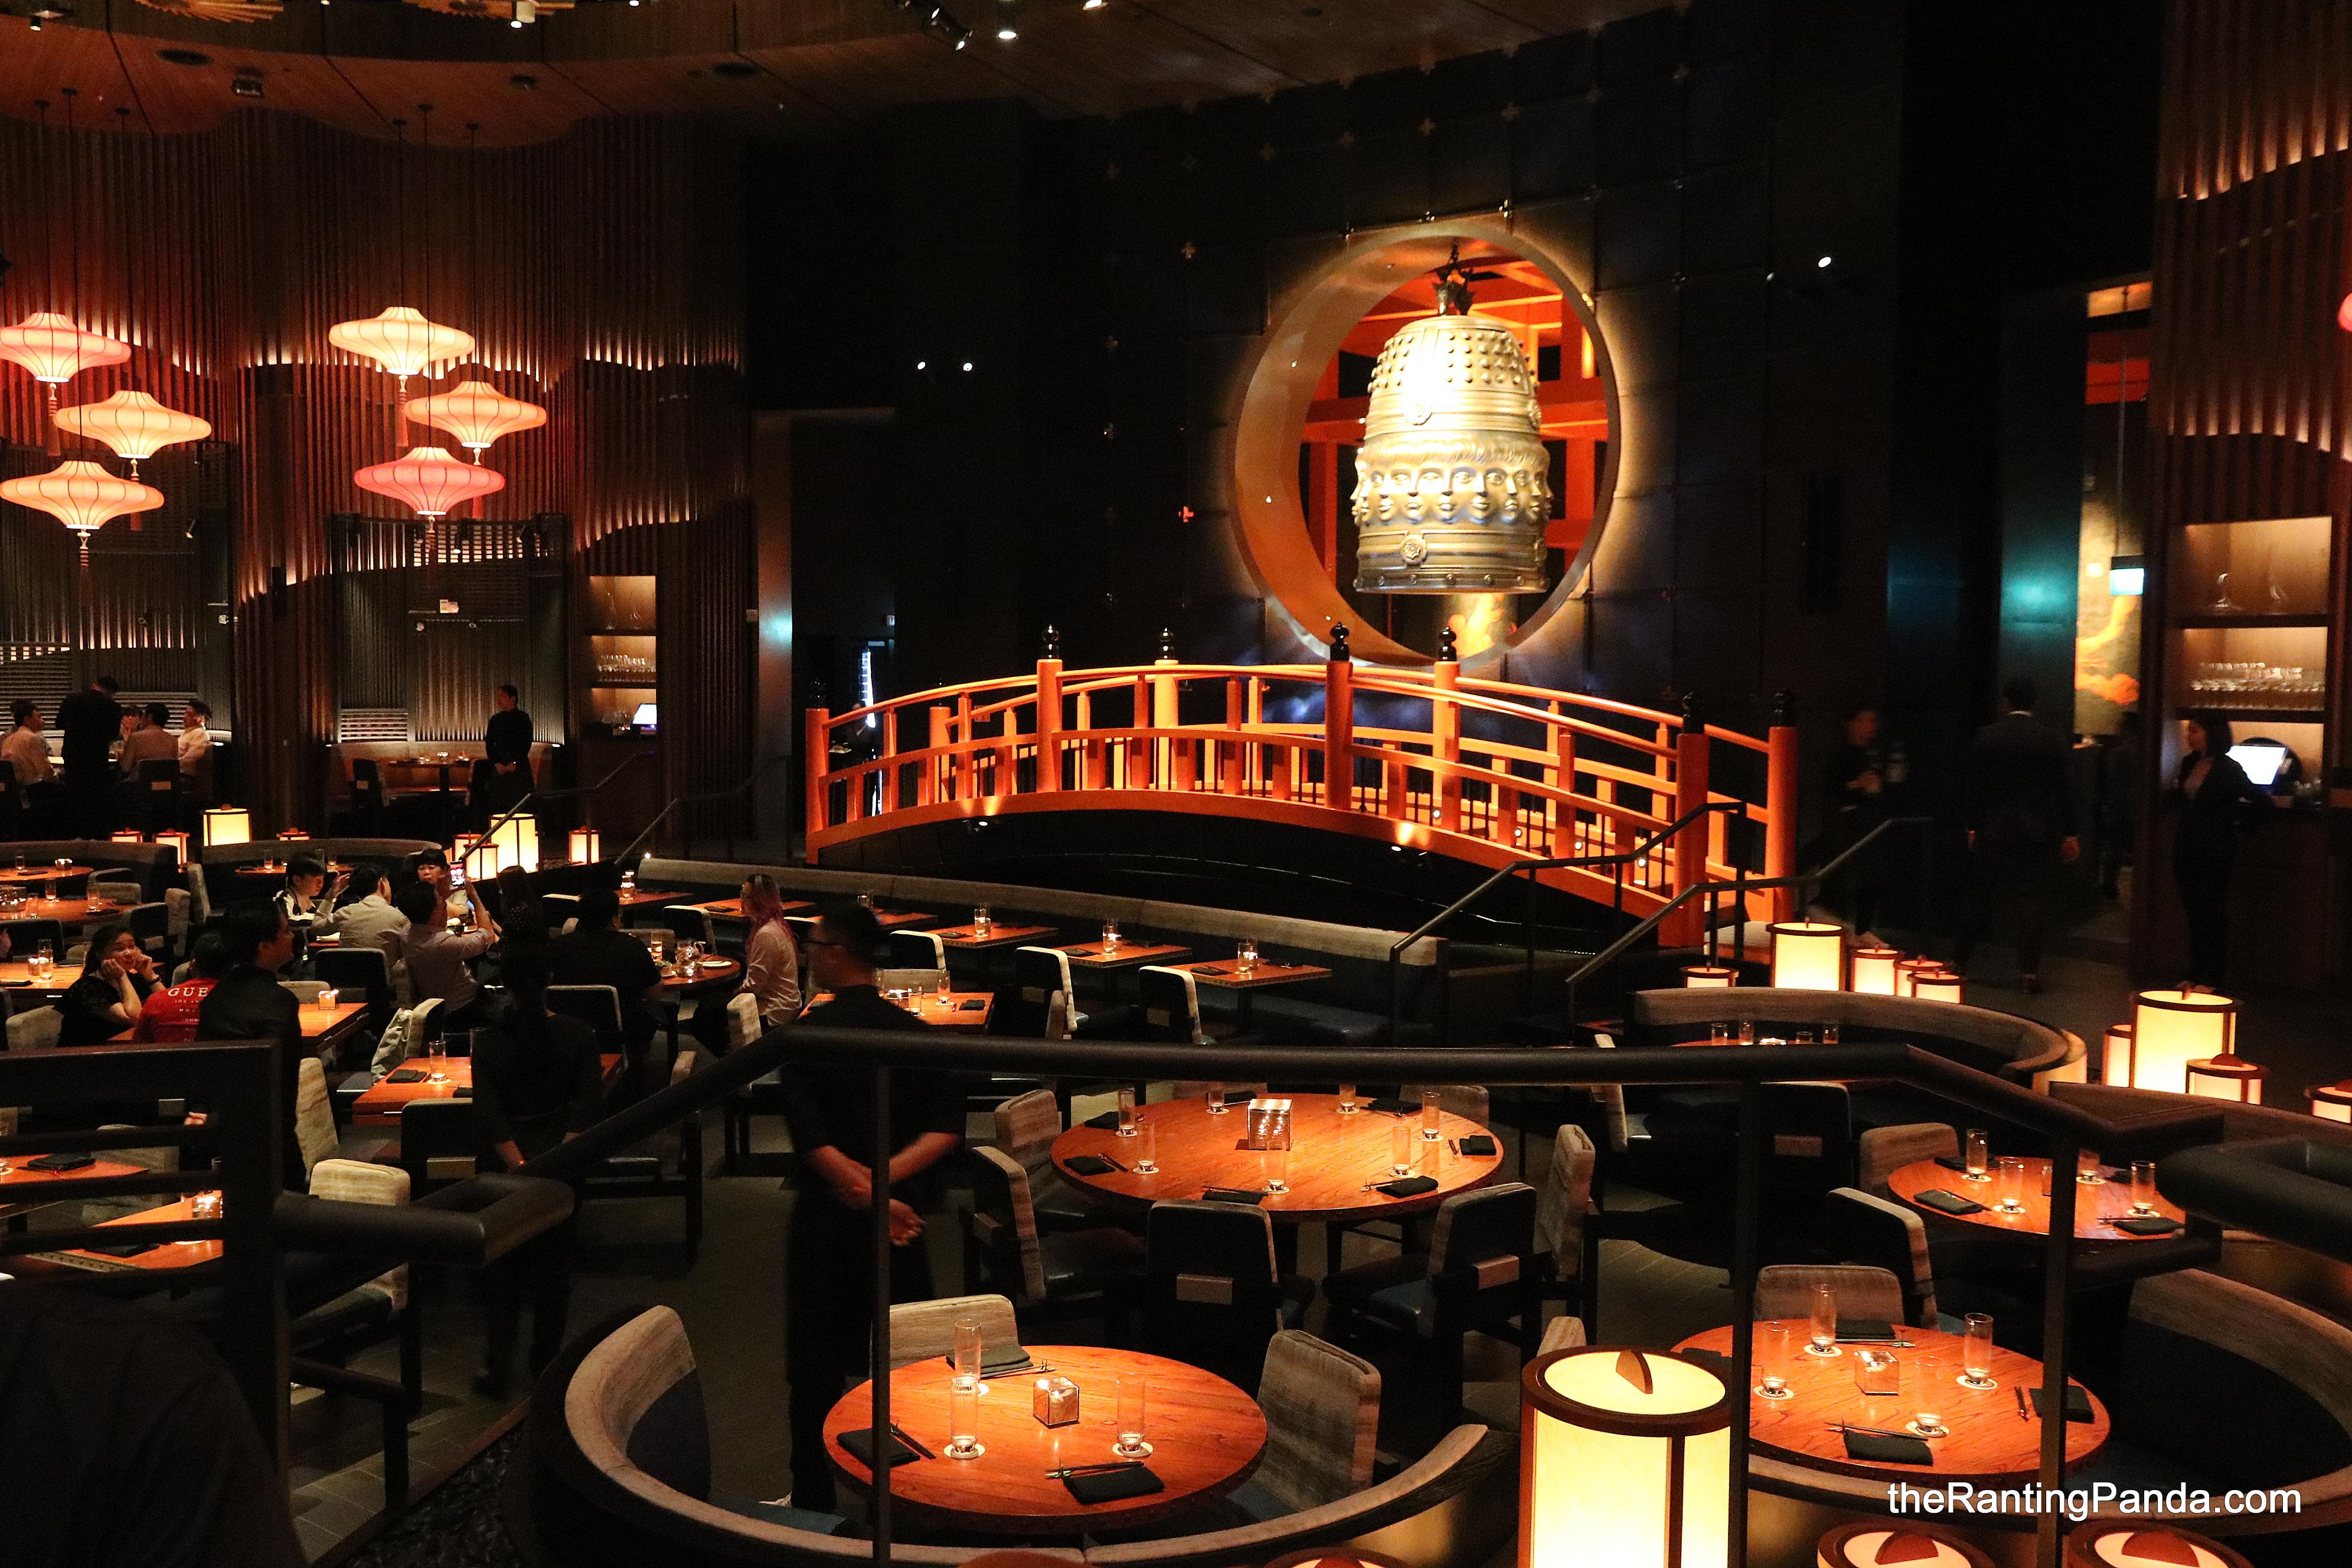 Sands casino singapore restaurants isle of capri casino resort biloxi